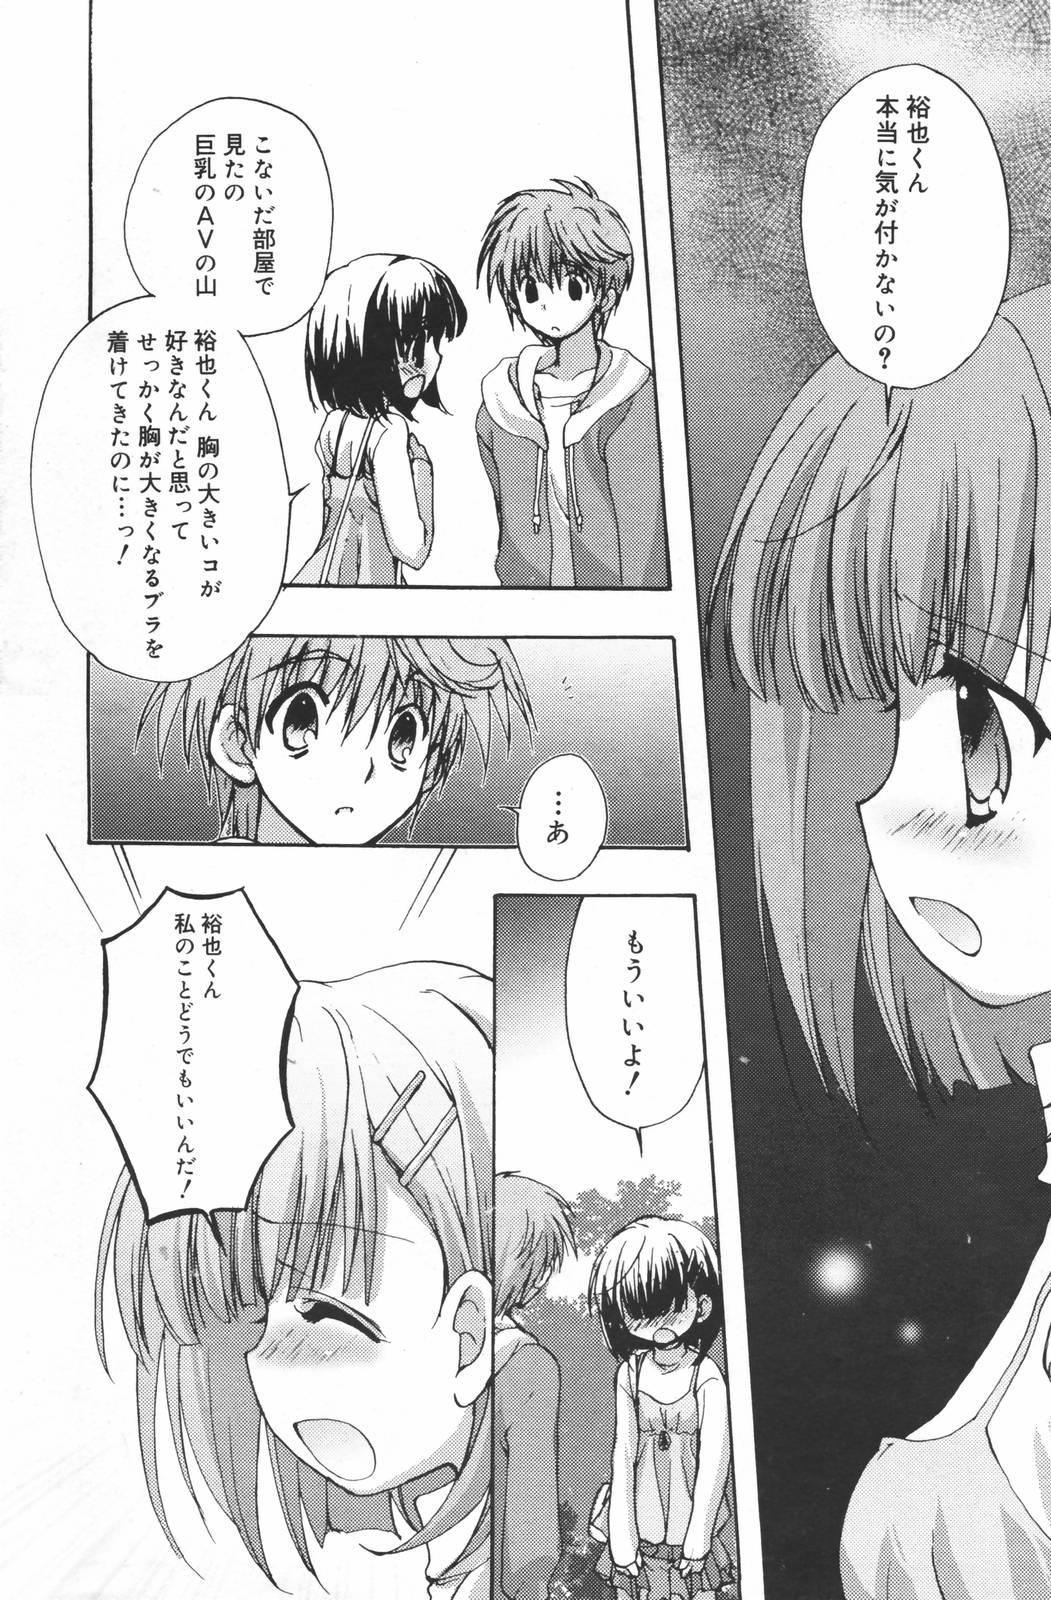 Manga Bangaichi 2007-03 81